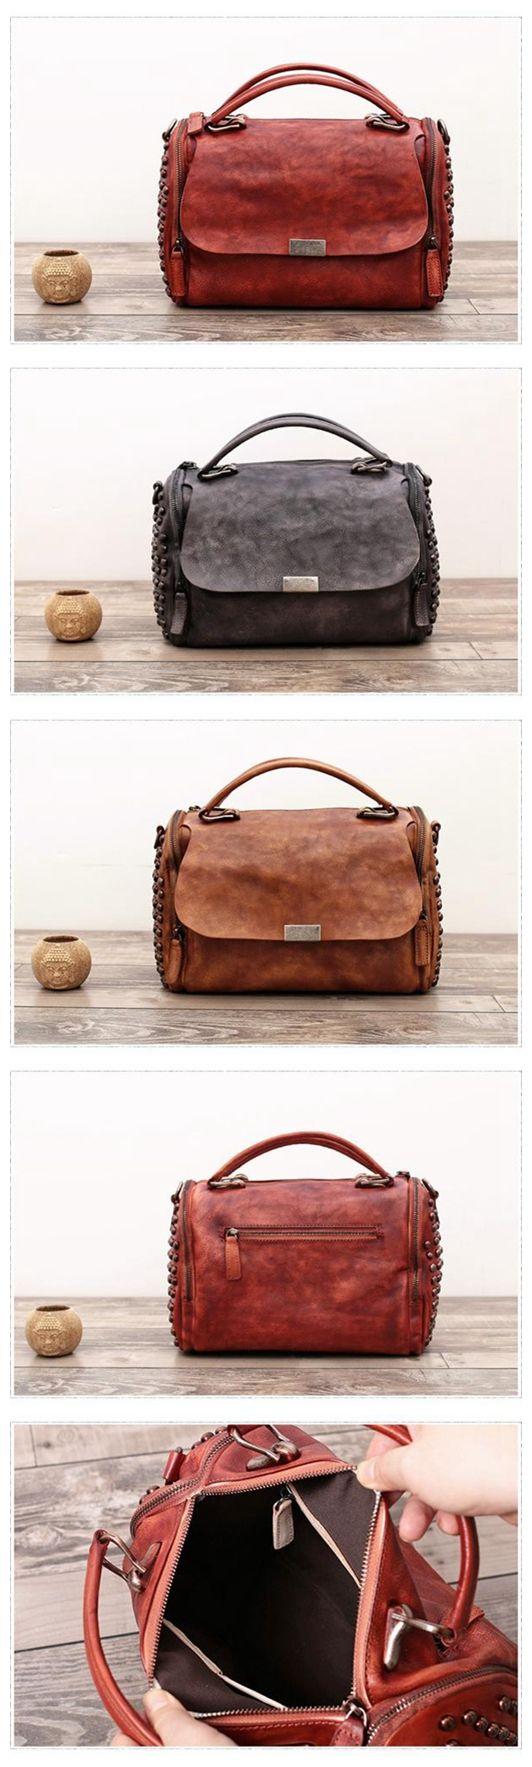 Handmade Full Grain Leather Messenger Shoulder Bag Satchel Handbag WF 85